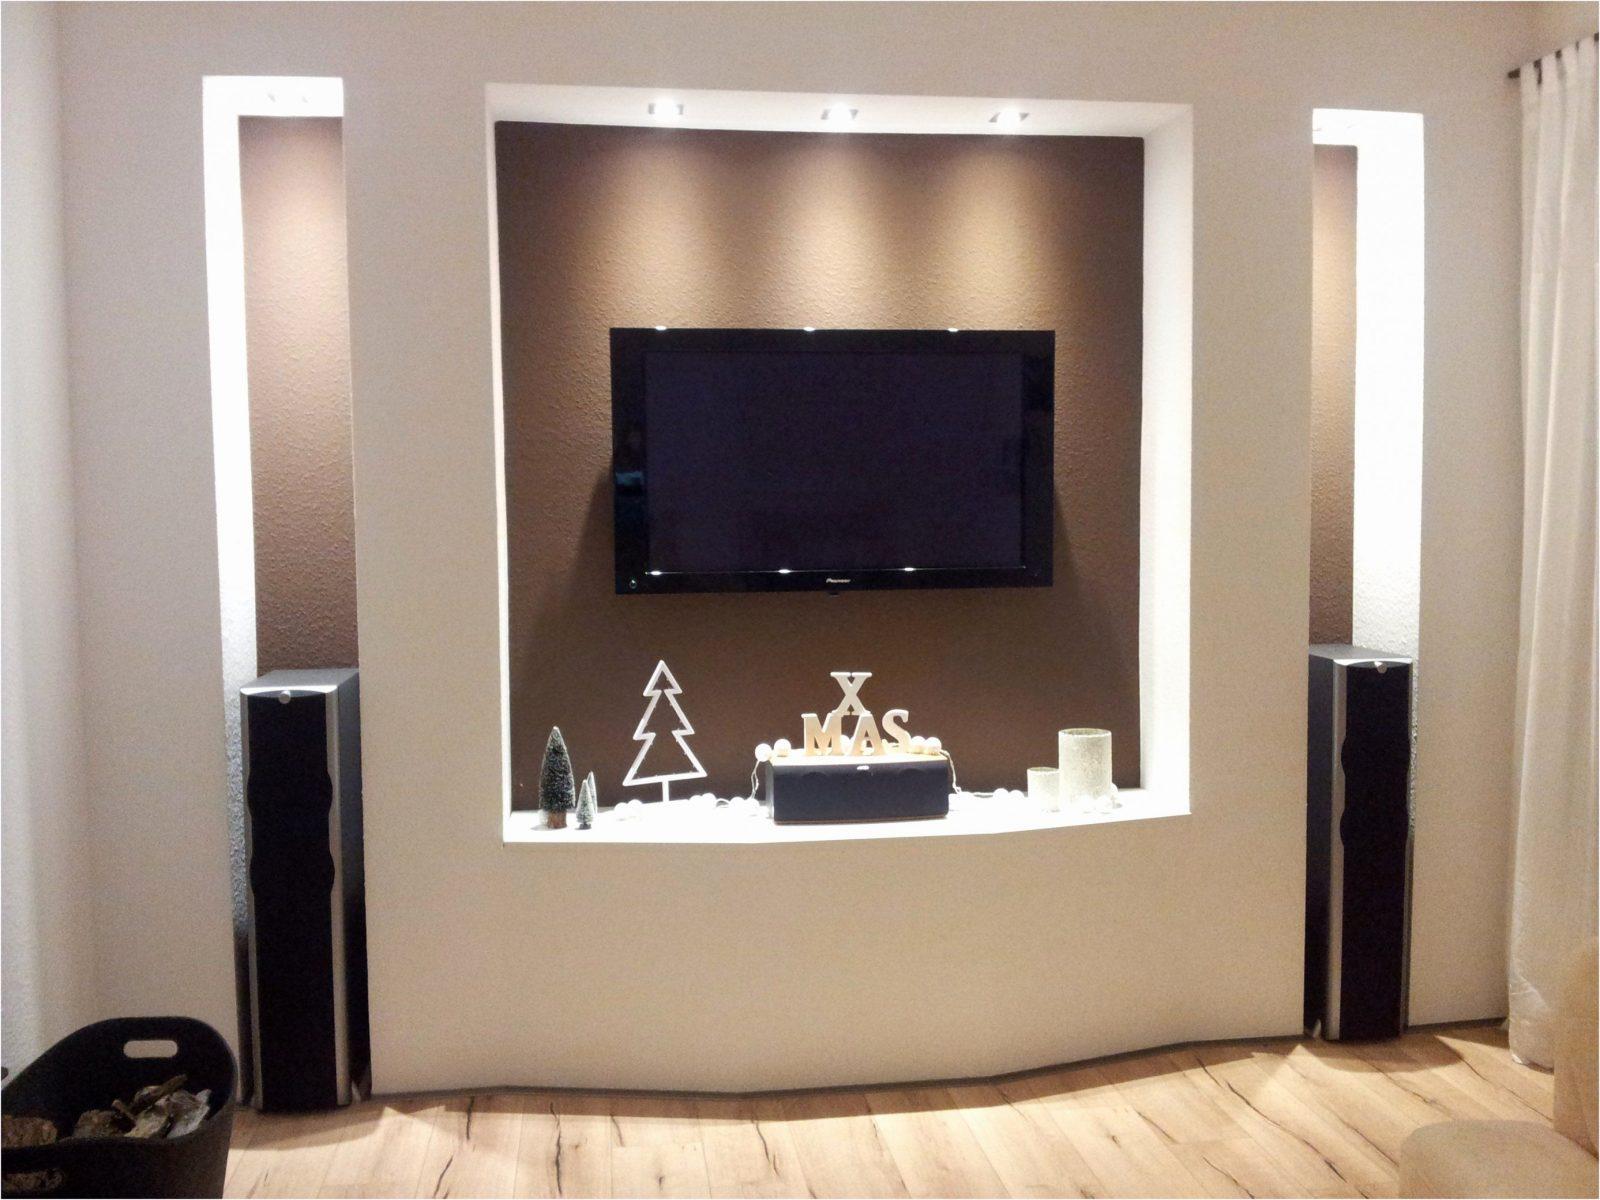 Tv Möbel Selber Bauen Luxus Tv Bank Selbst Bauen Gallery Excellent von Tv Bank Selber Bauen Photo